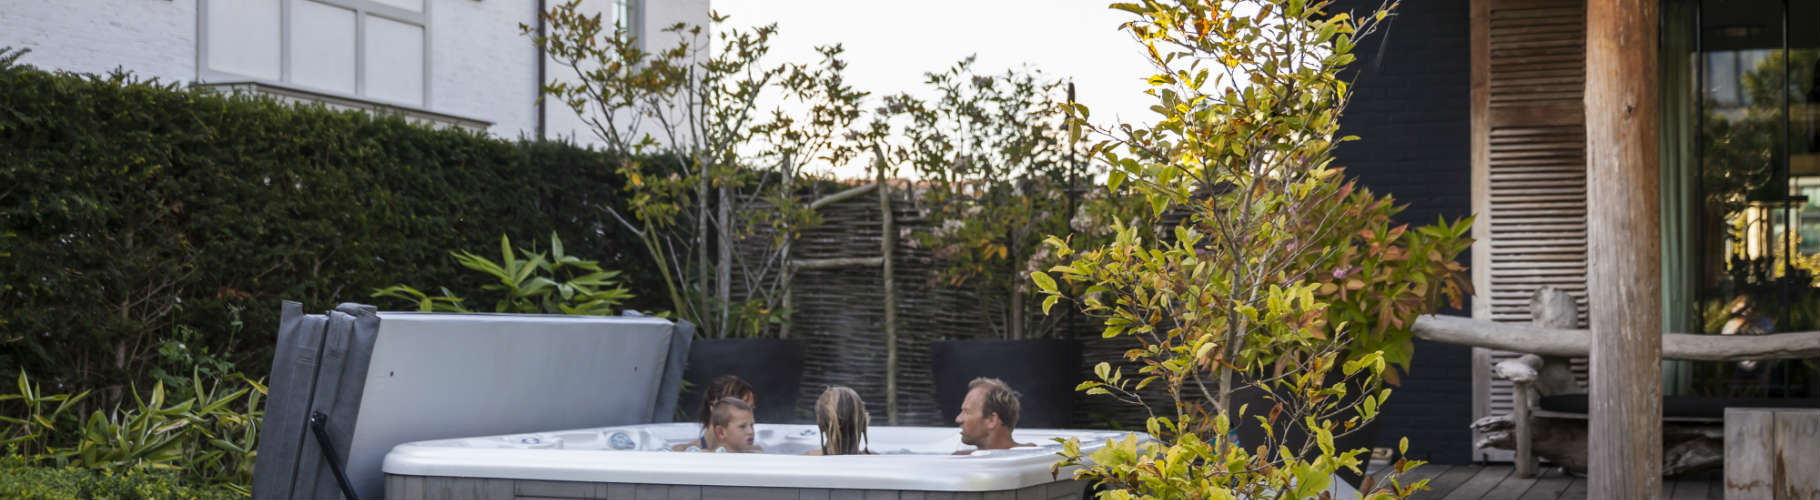 jacuzzi dans le jardin jacuzzi jacuzzi dans jardin jacuzzi jardin. Black Bedroom Furniture Sets. Home Design Ideas